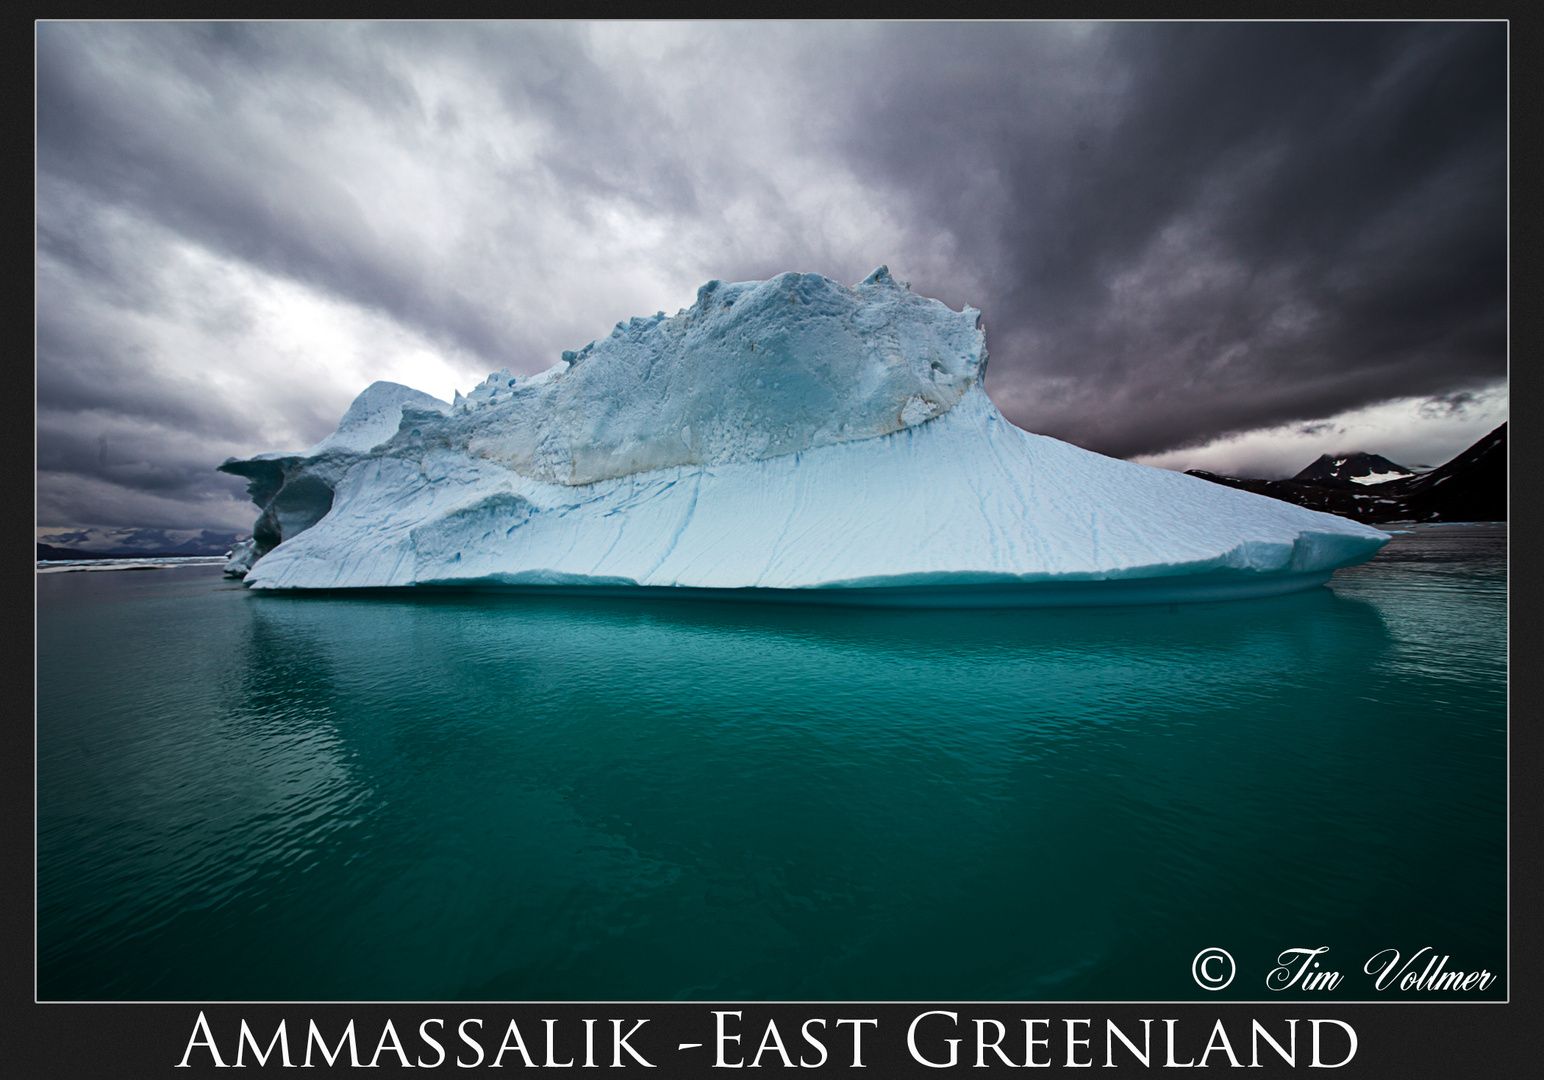 Dream of Greenland